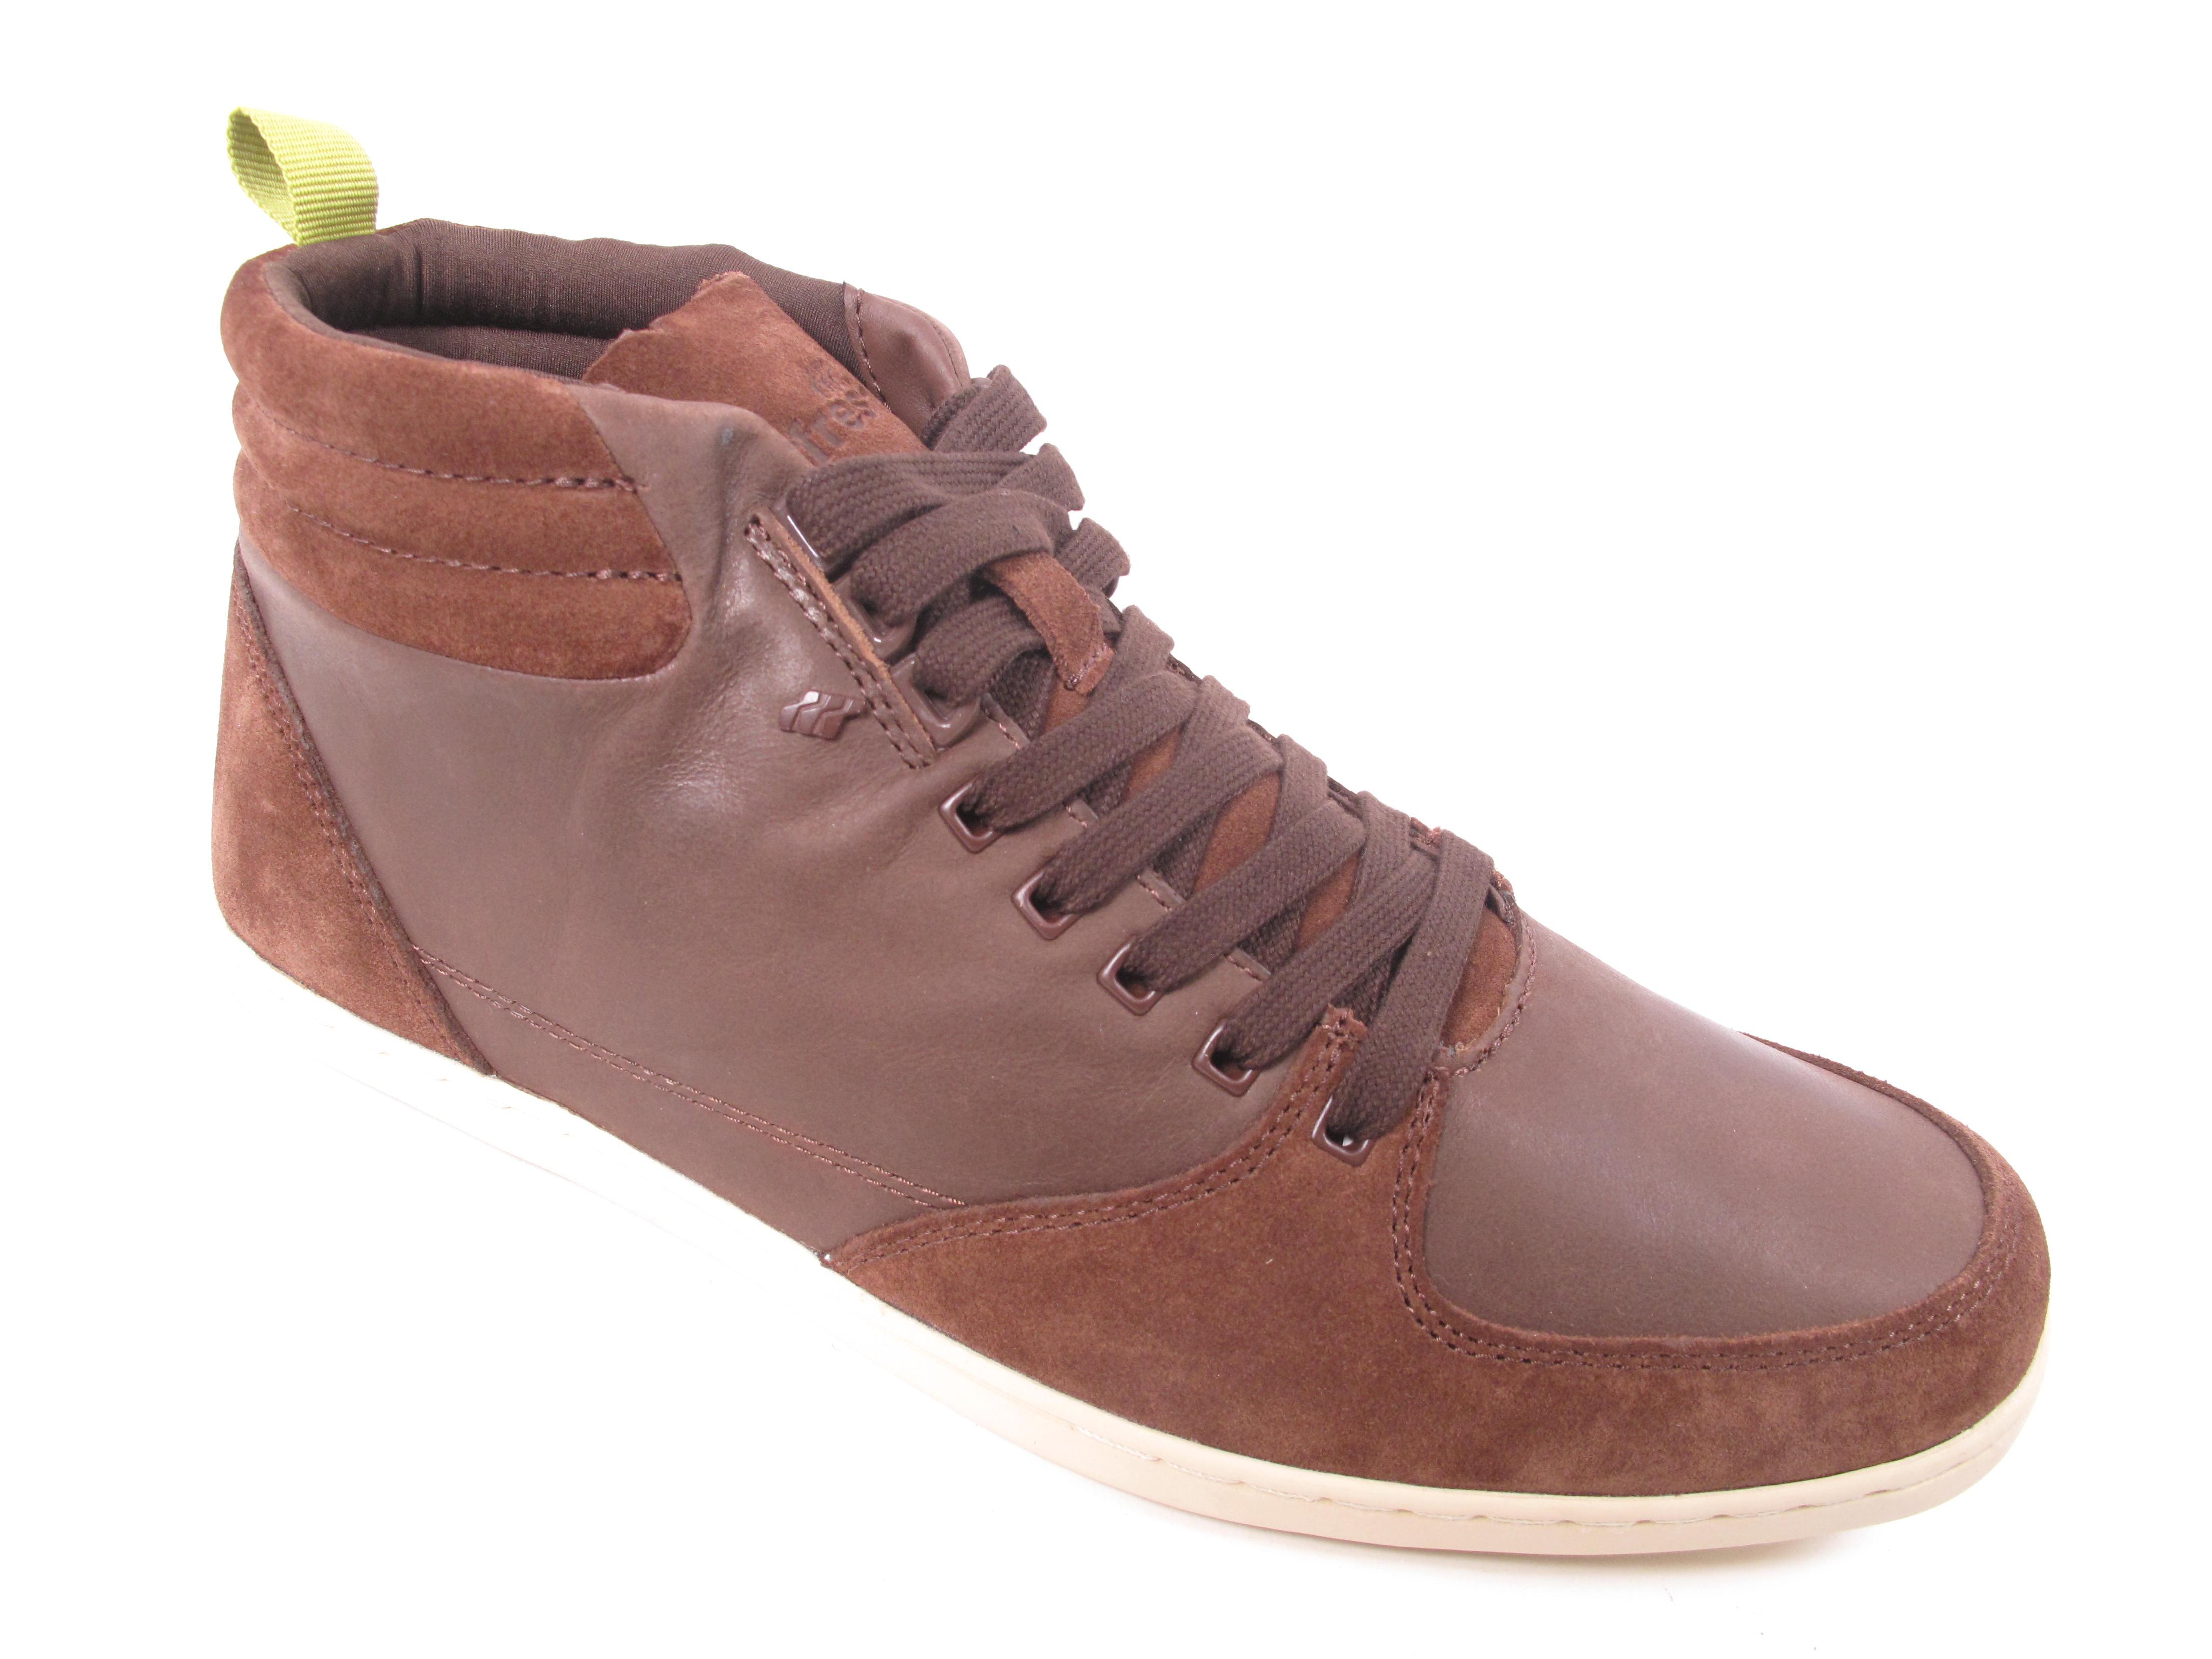 Boxfresh eplett eplett eplett Uomo scarpe da ginnastica Scarpe da ginnastica Scarpe per il tempo libero e15066 Marroneee Nuovo 594cee